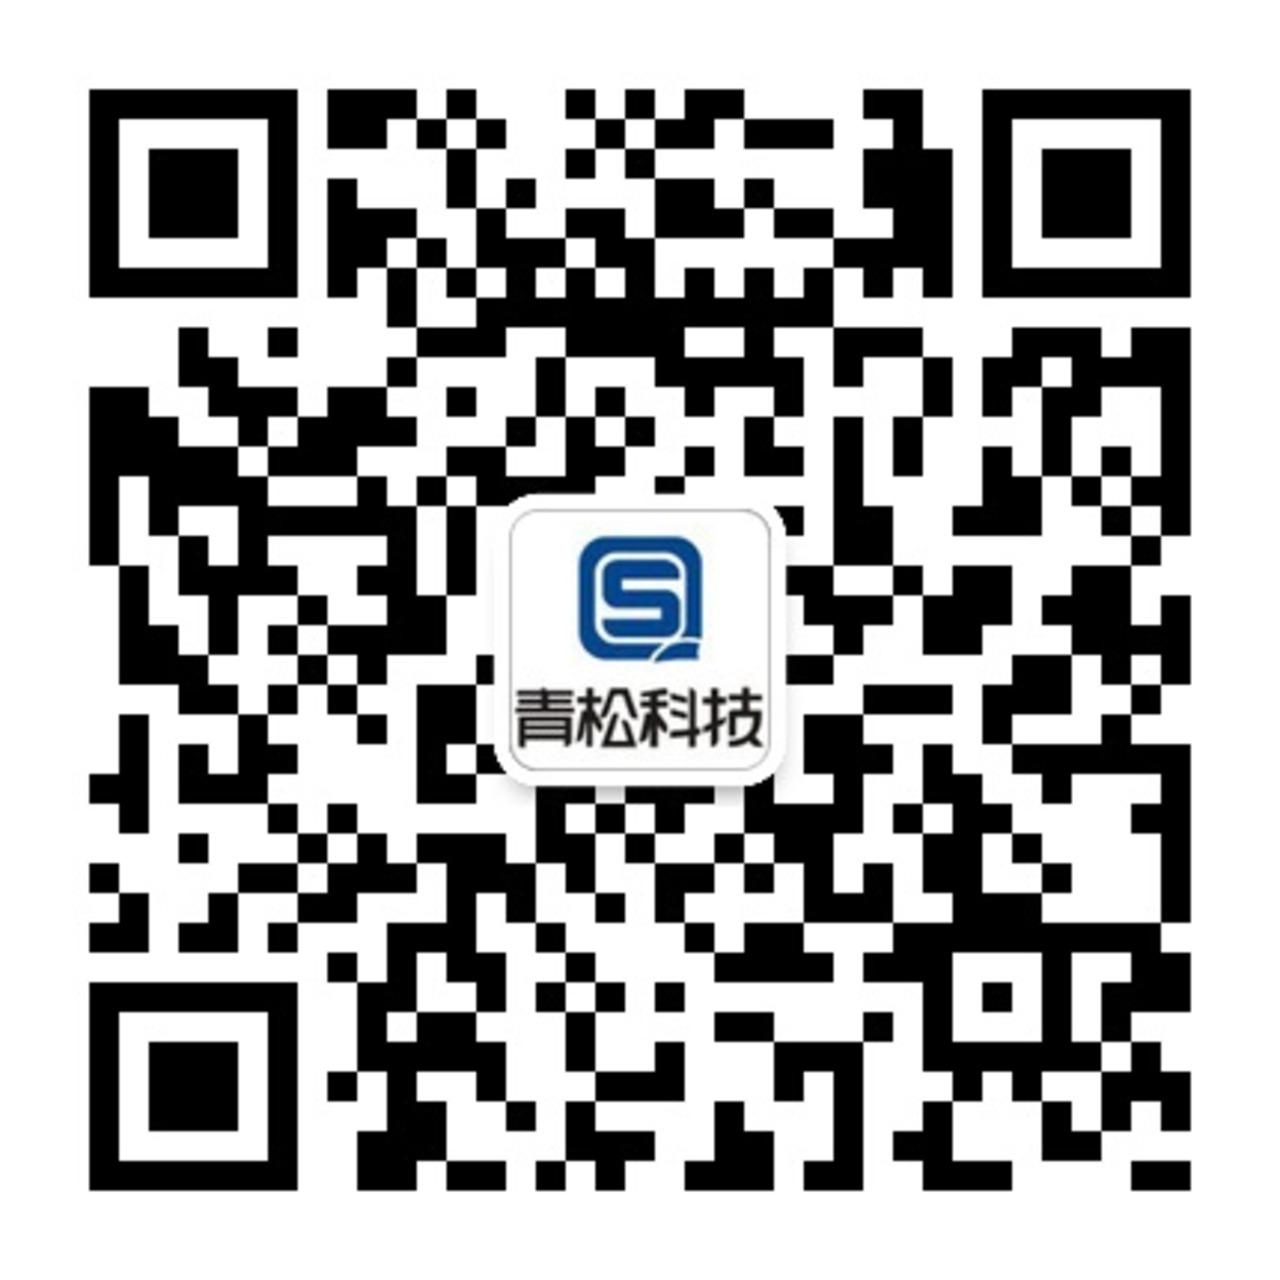 微信号:http://www.ds-360.com/upfiles/wx/201681133428.jpg